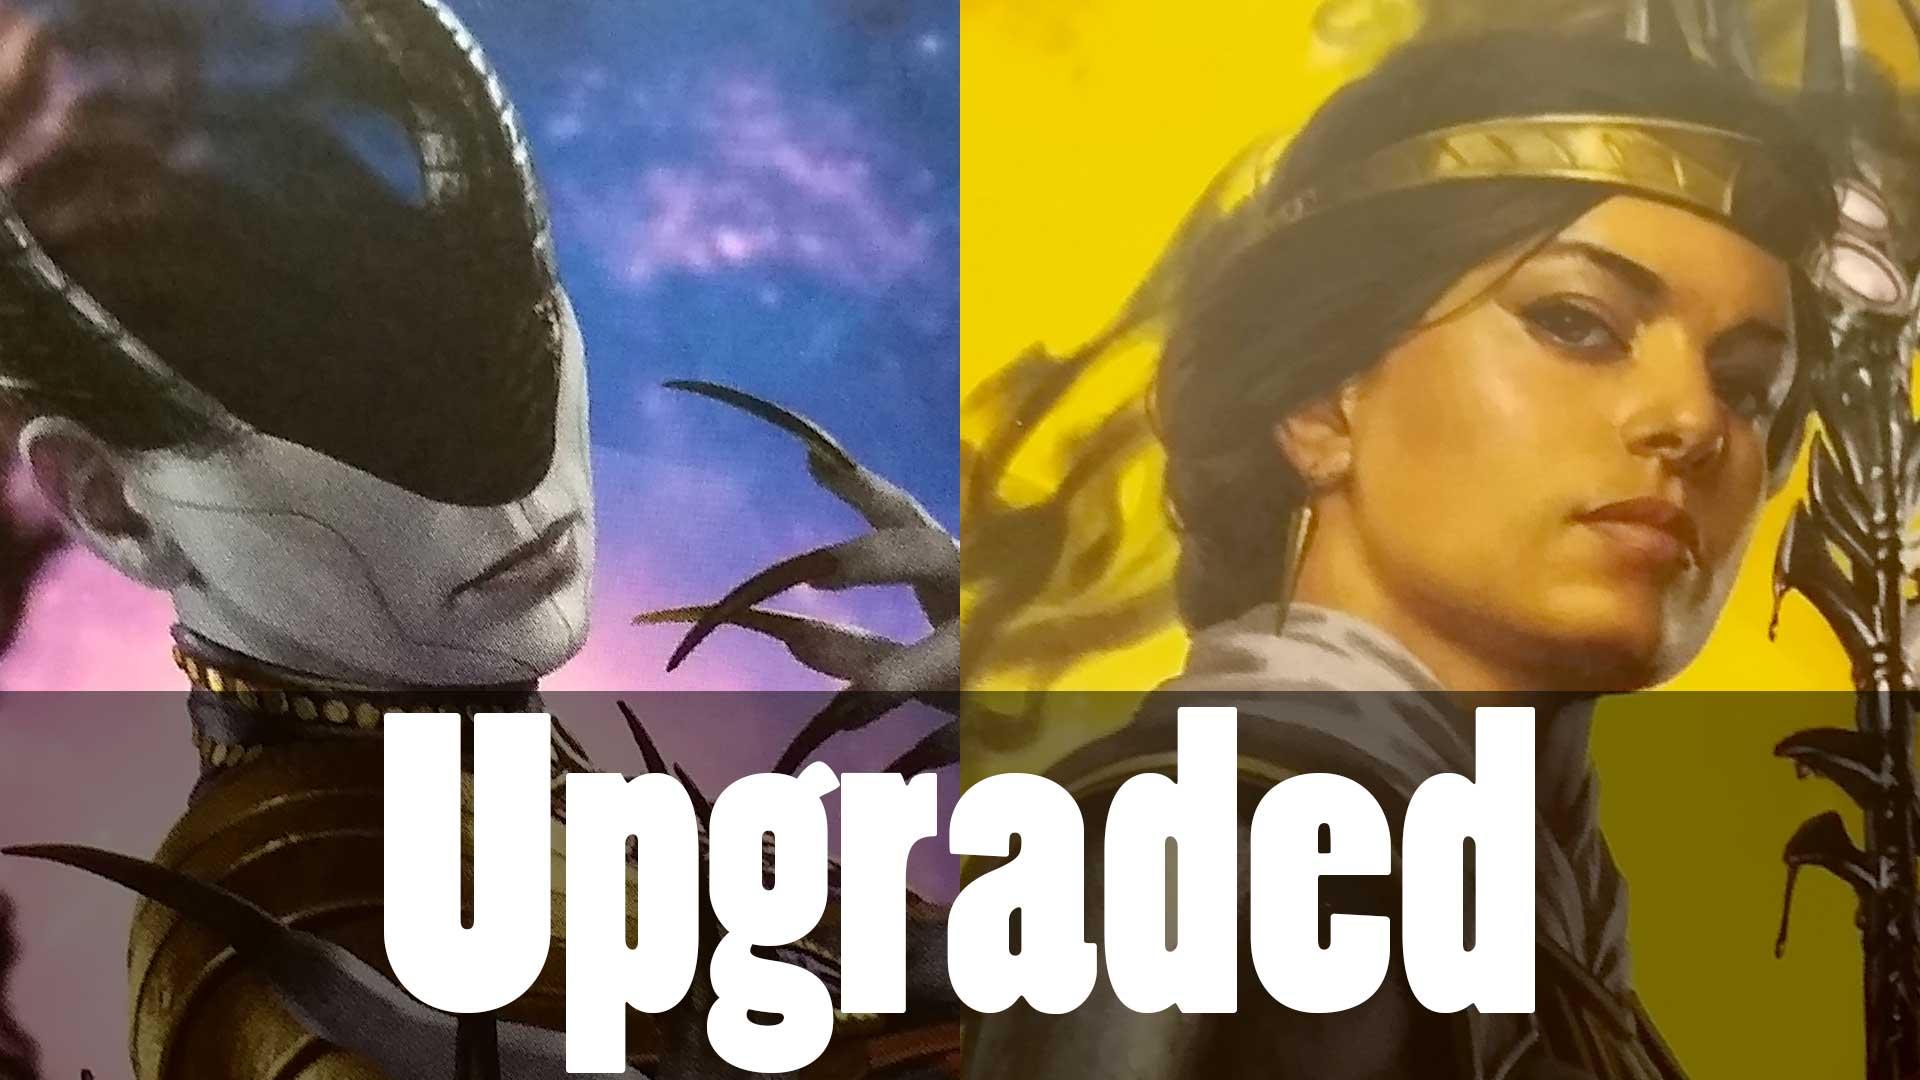 Ashiok and Elspeth Planeswalker Decks Get an Upgrade